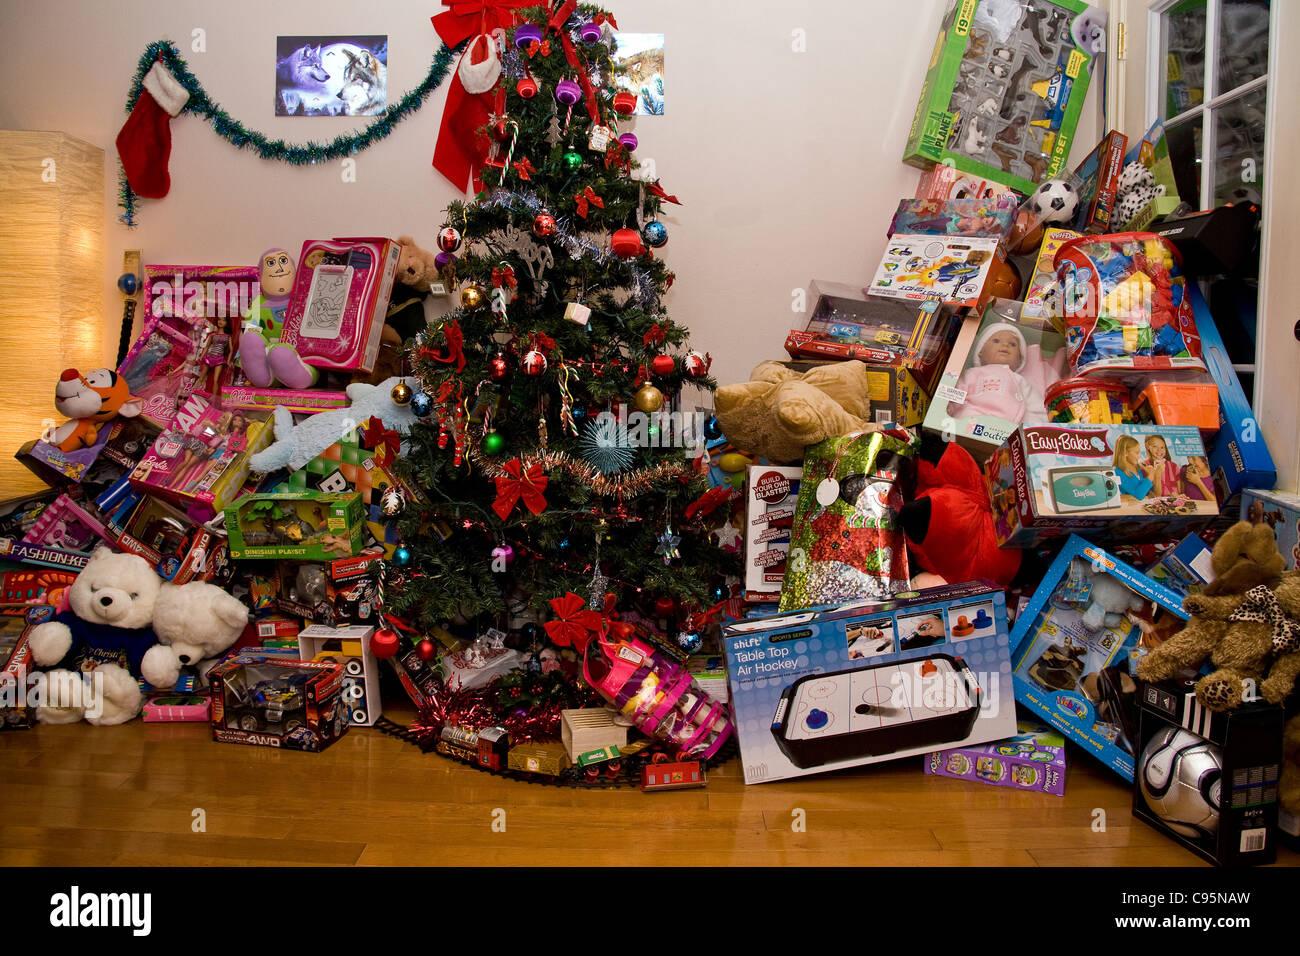 Christmas Tree, Lots Of Presents Stock Photo: 40079169